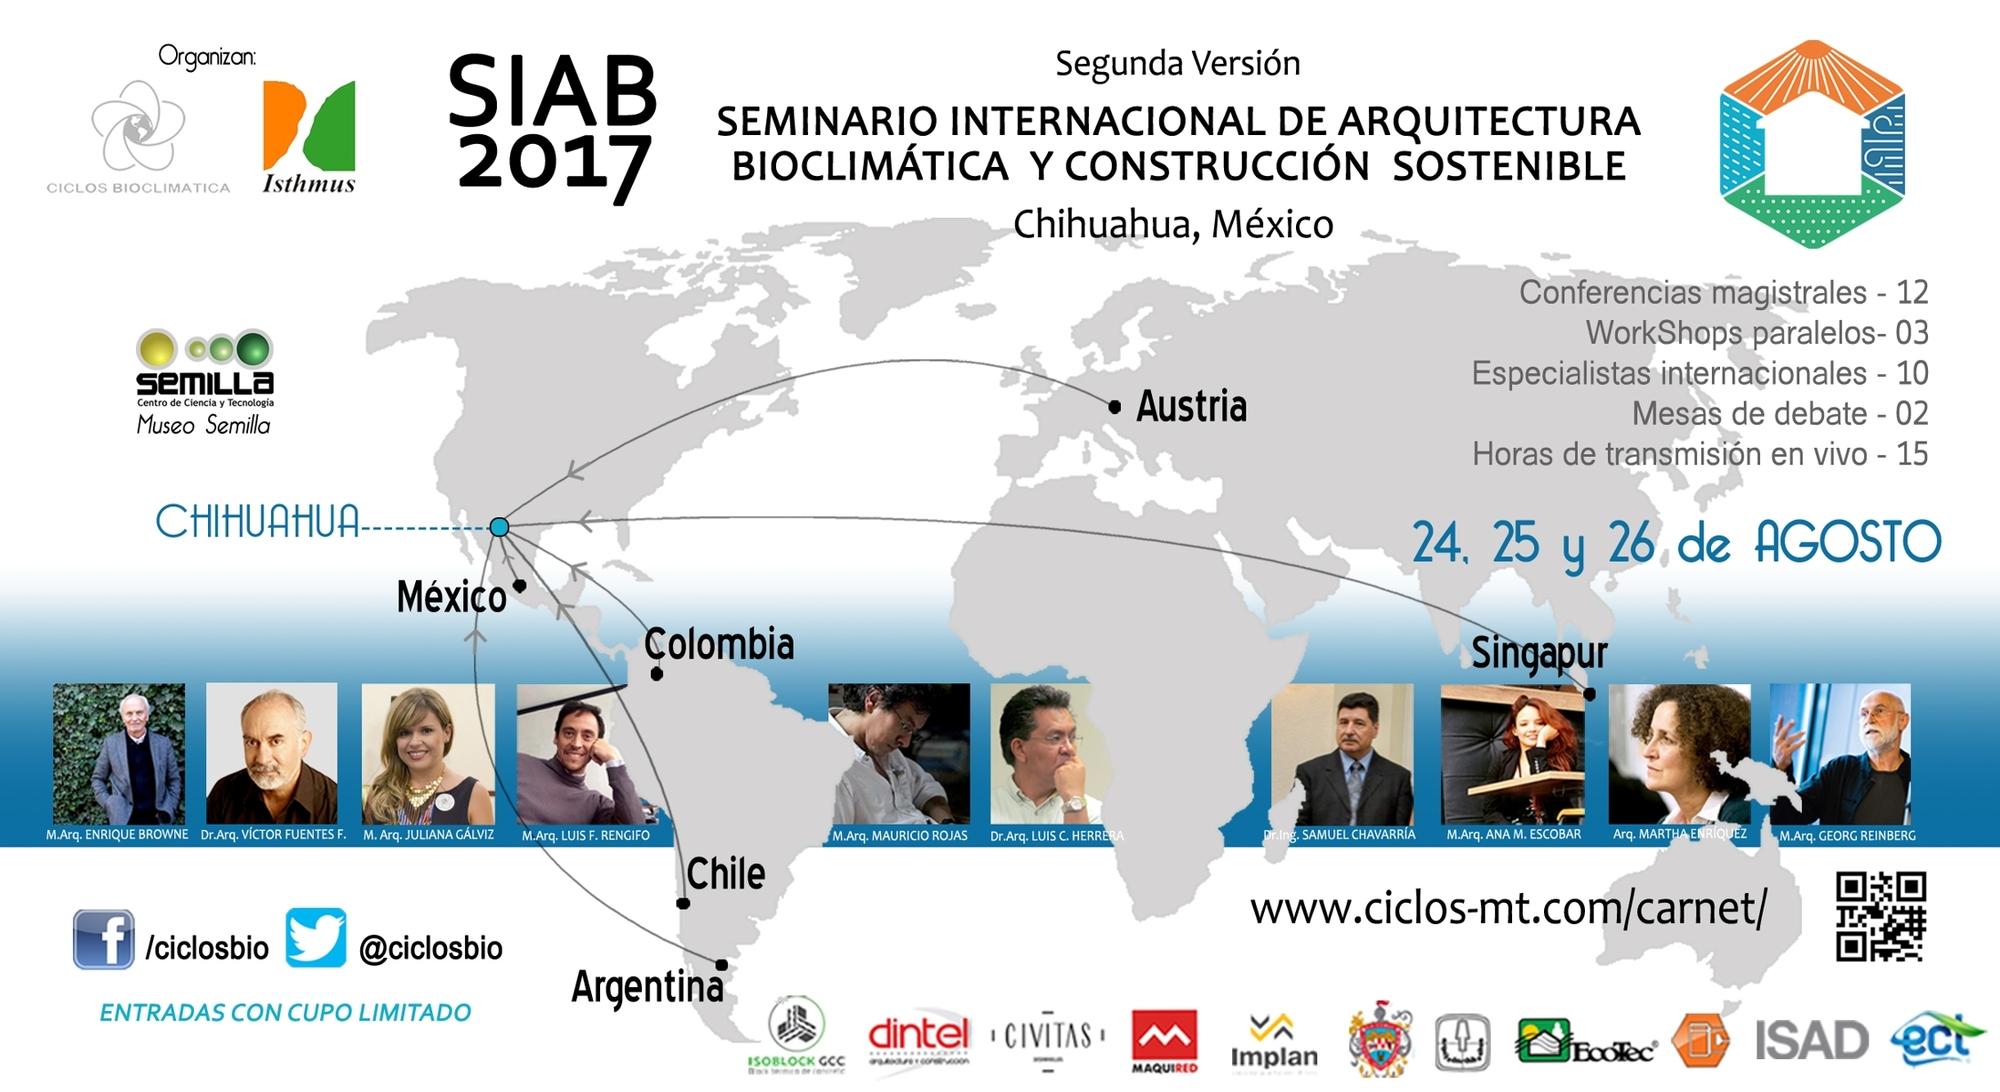 Siab2017 seminario internacional de arquitectura for Aulas web arquitectura